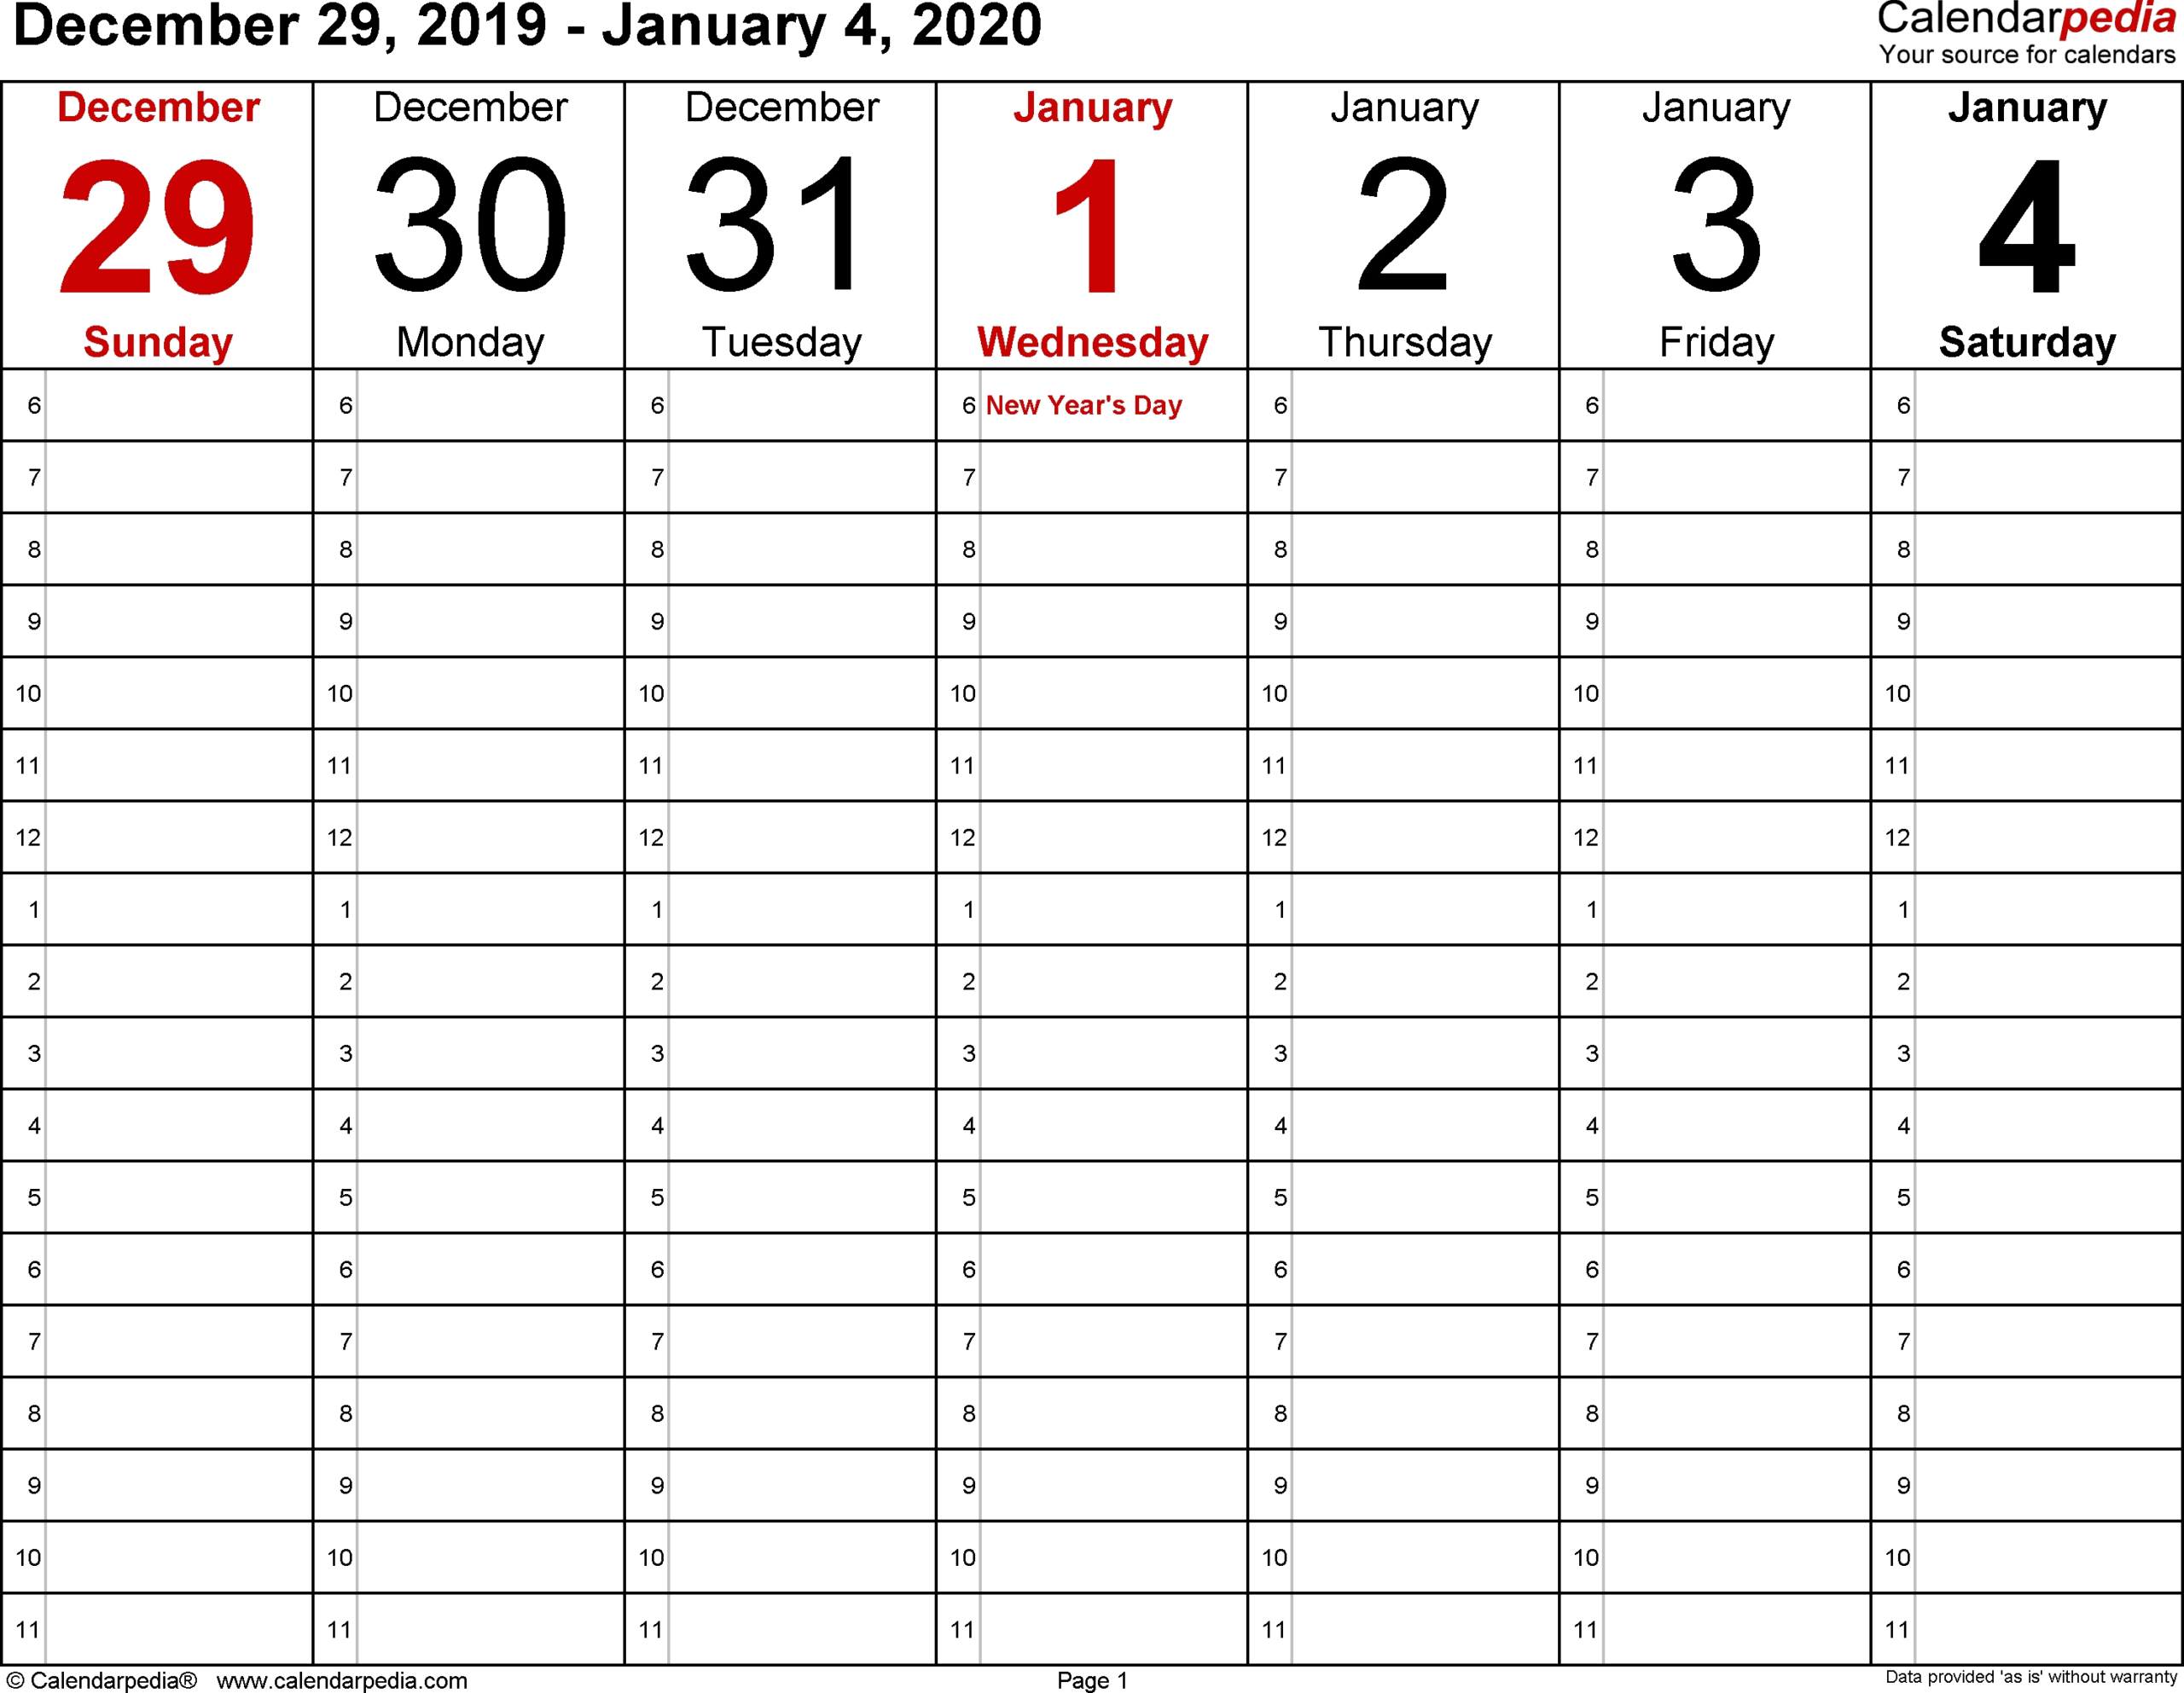 2020 Calendar 8.5 X 11 - Calendar Inspiration Design